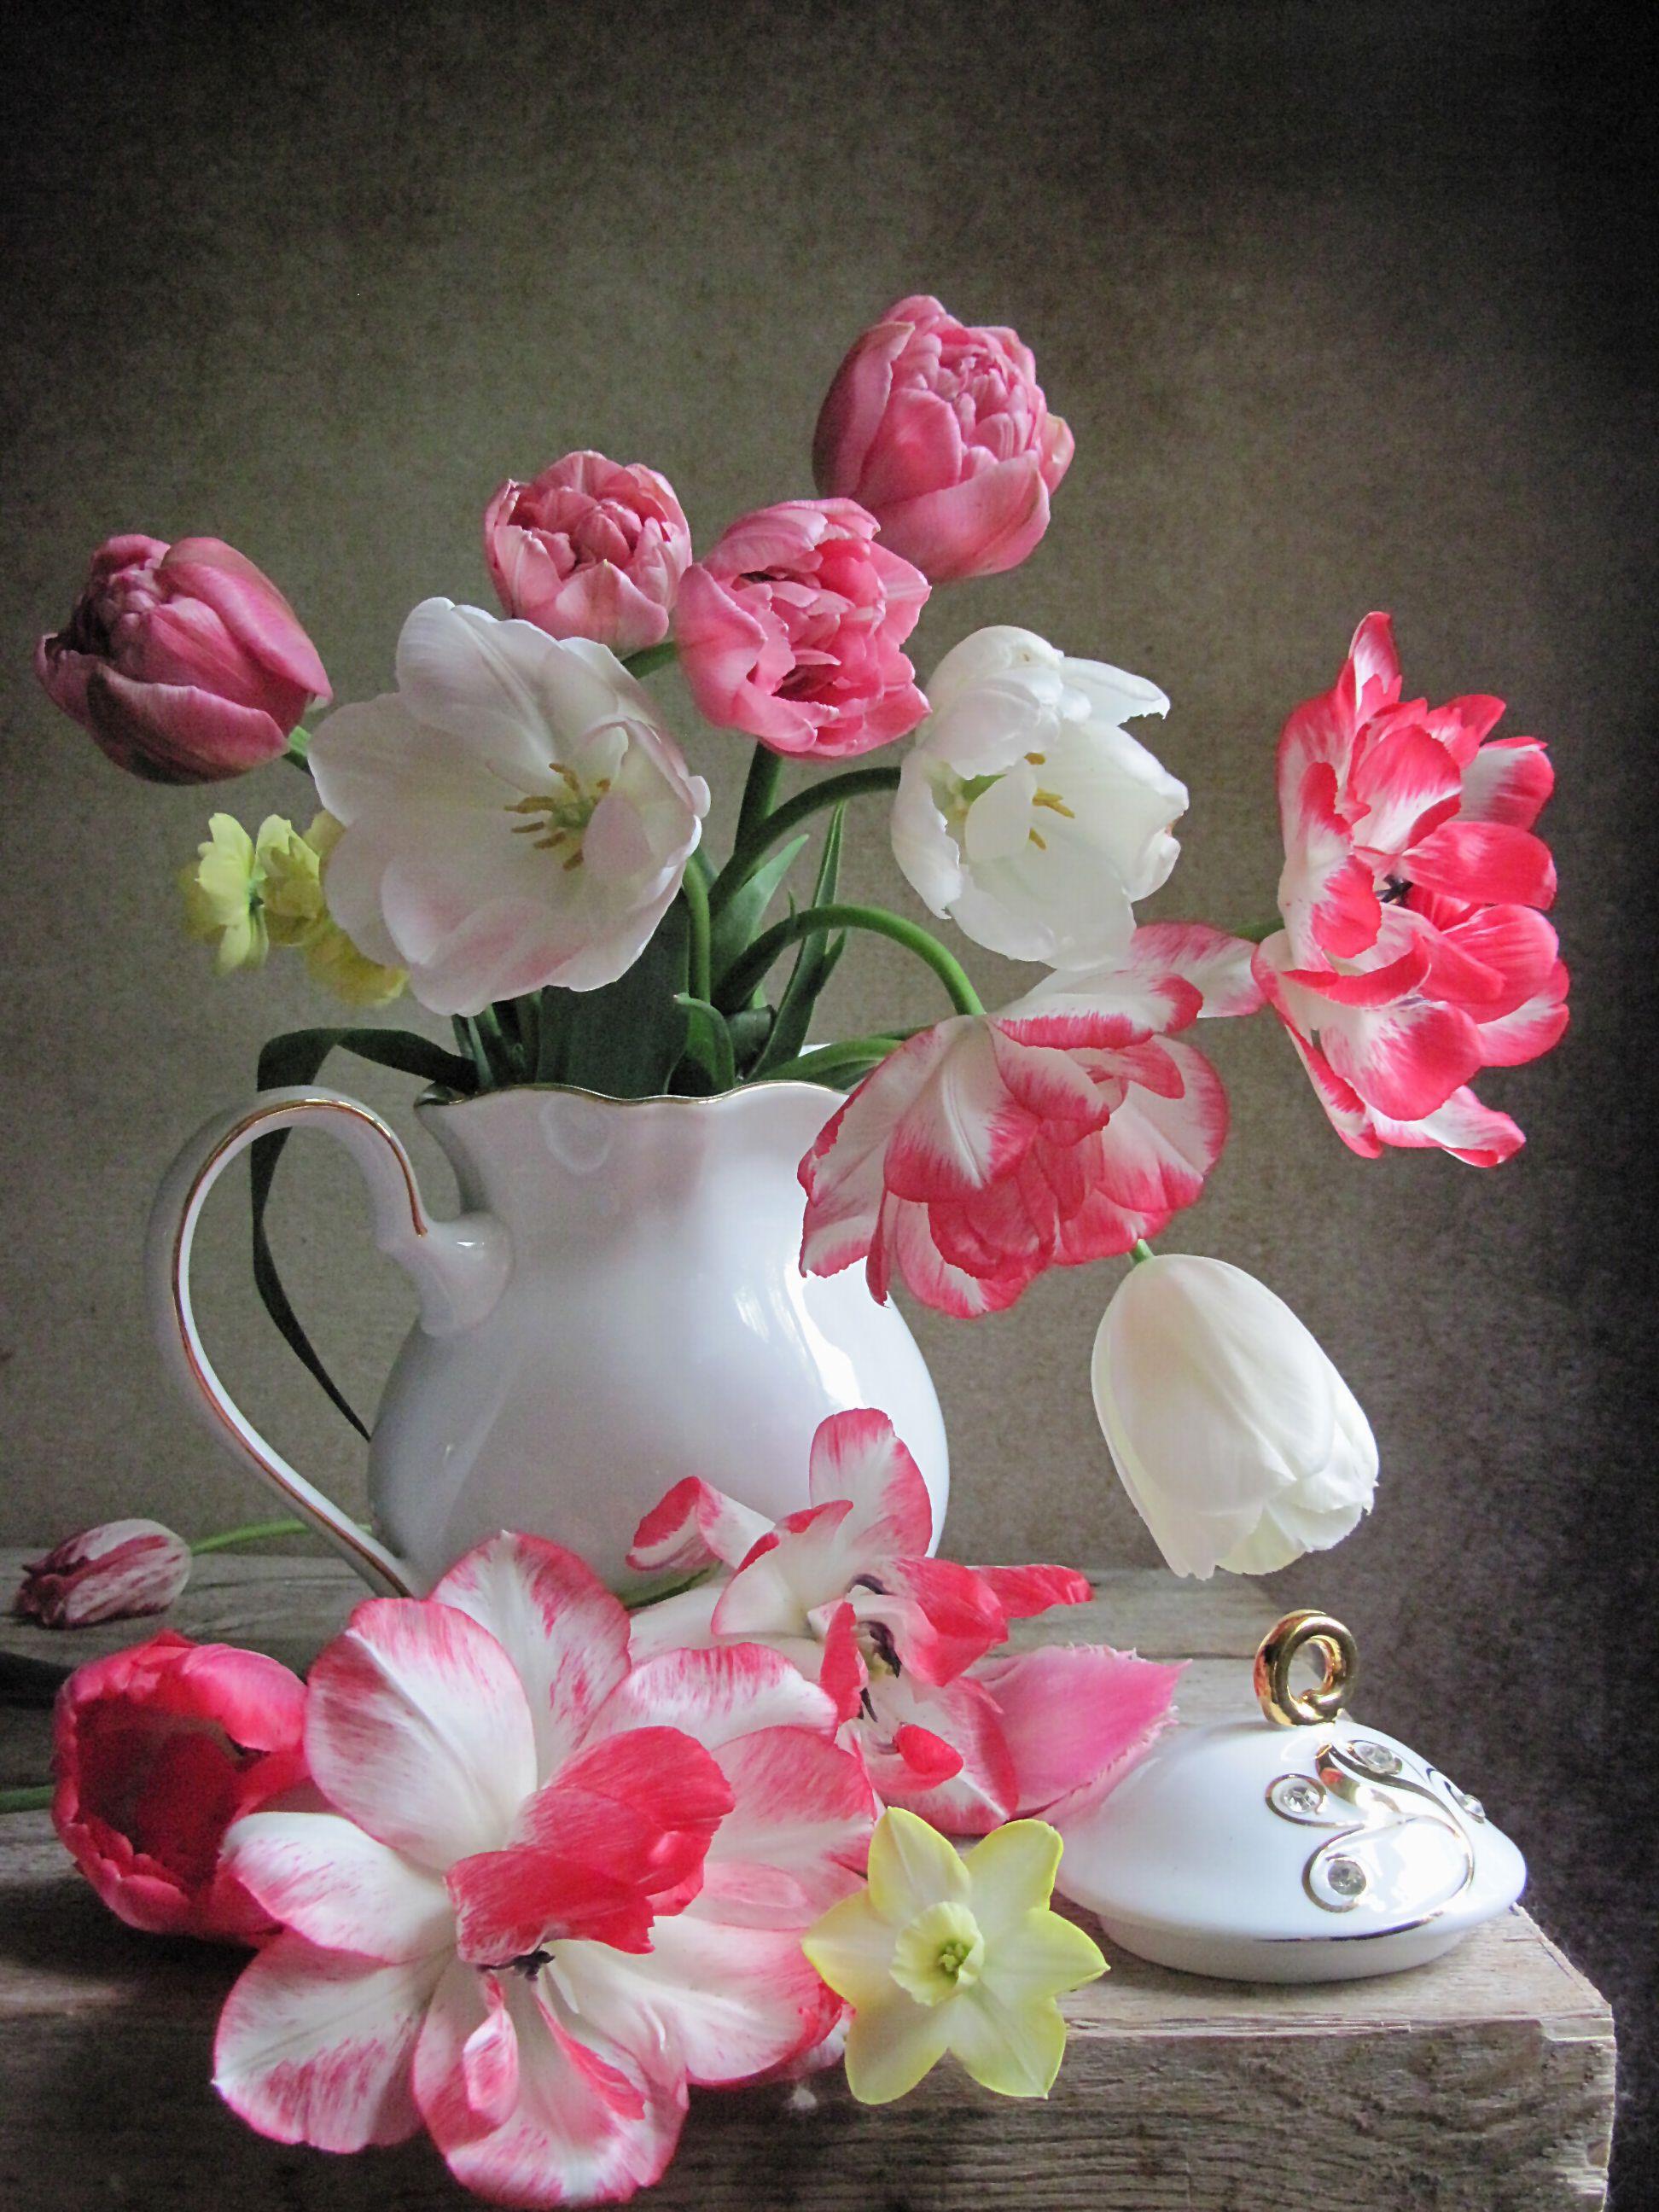 цветы, букет, тюльпаны, нарциссы, фарфор, Тихомирова Наталия